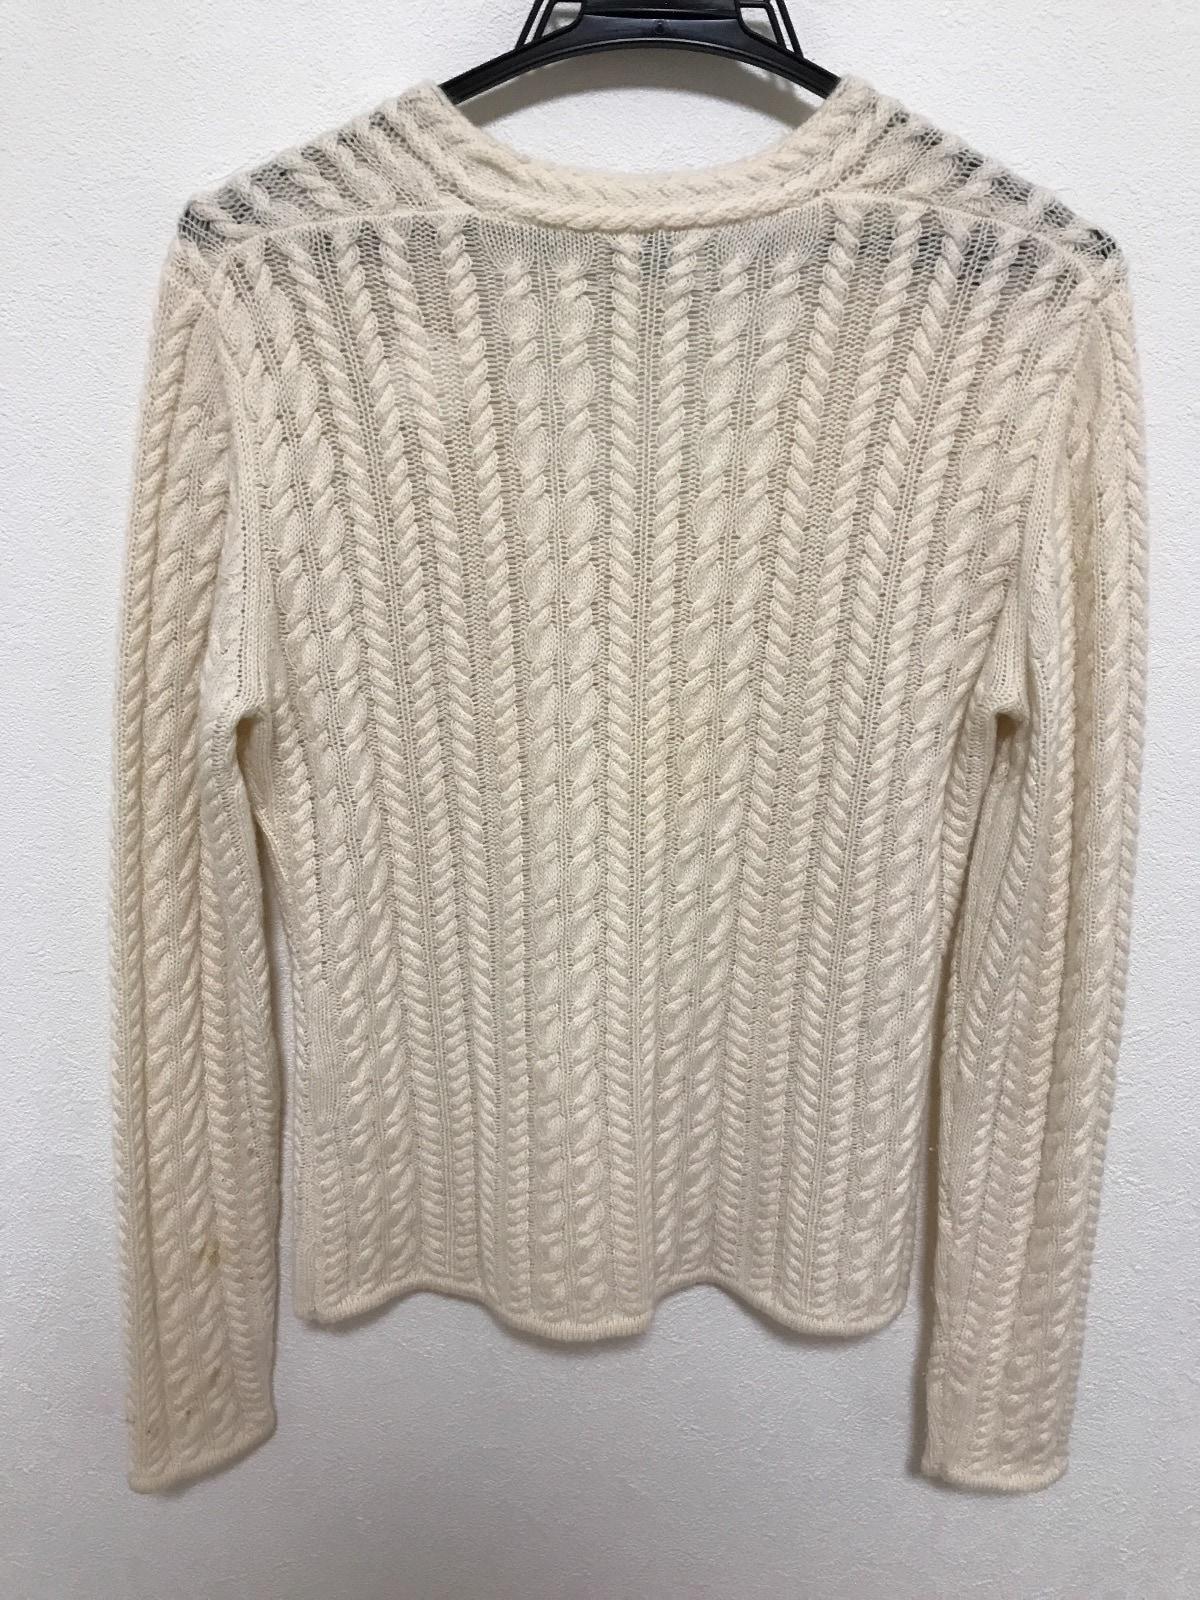 Neiman Marcus(ニーマンマーカス)のセーター